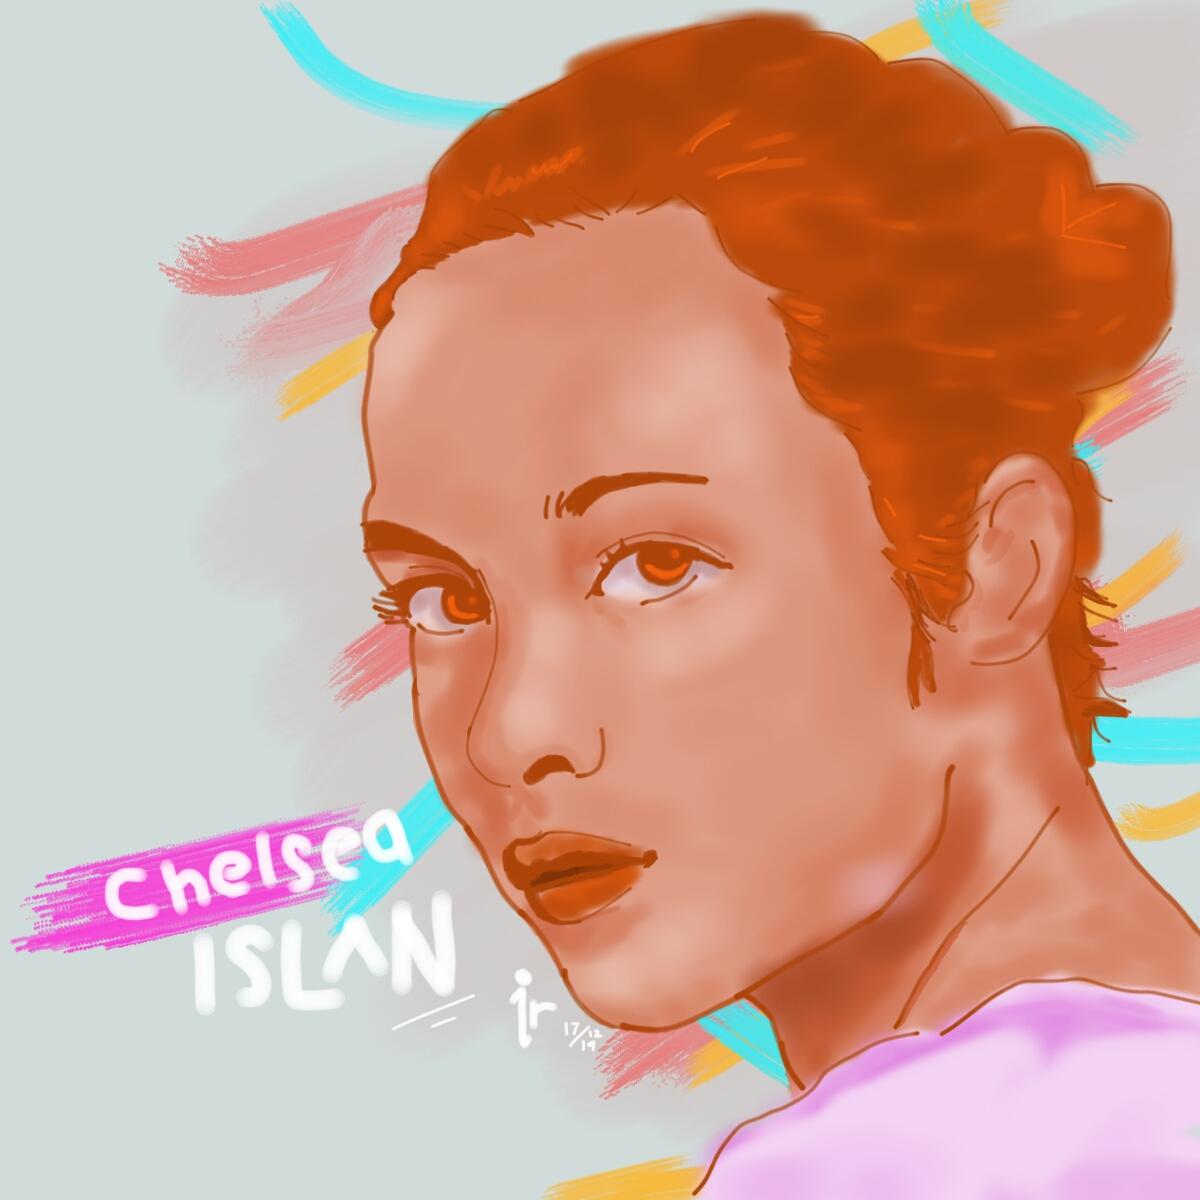 Chelsea Islan